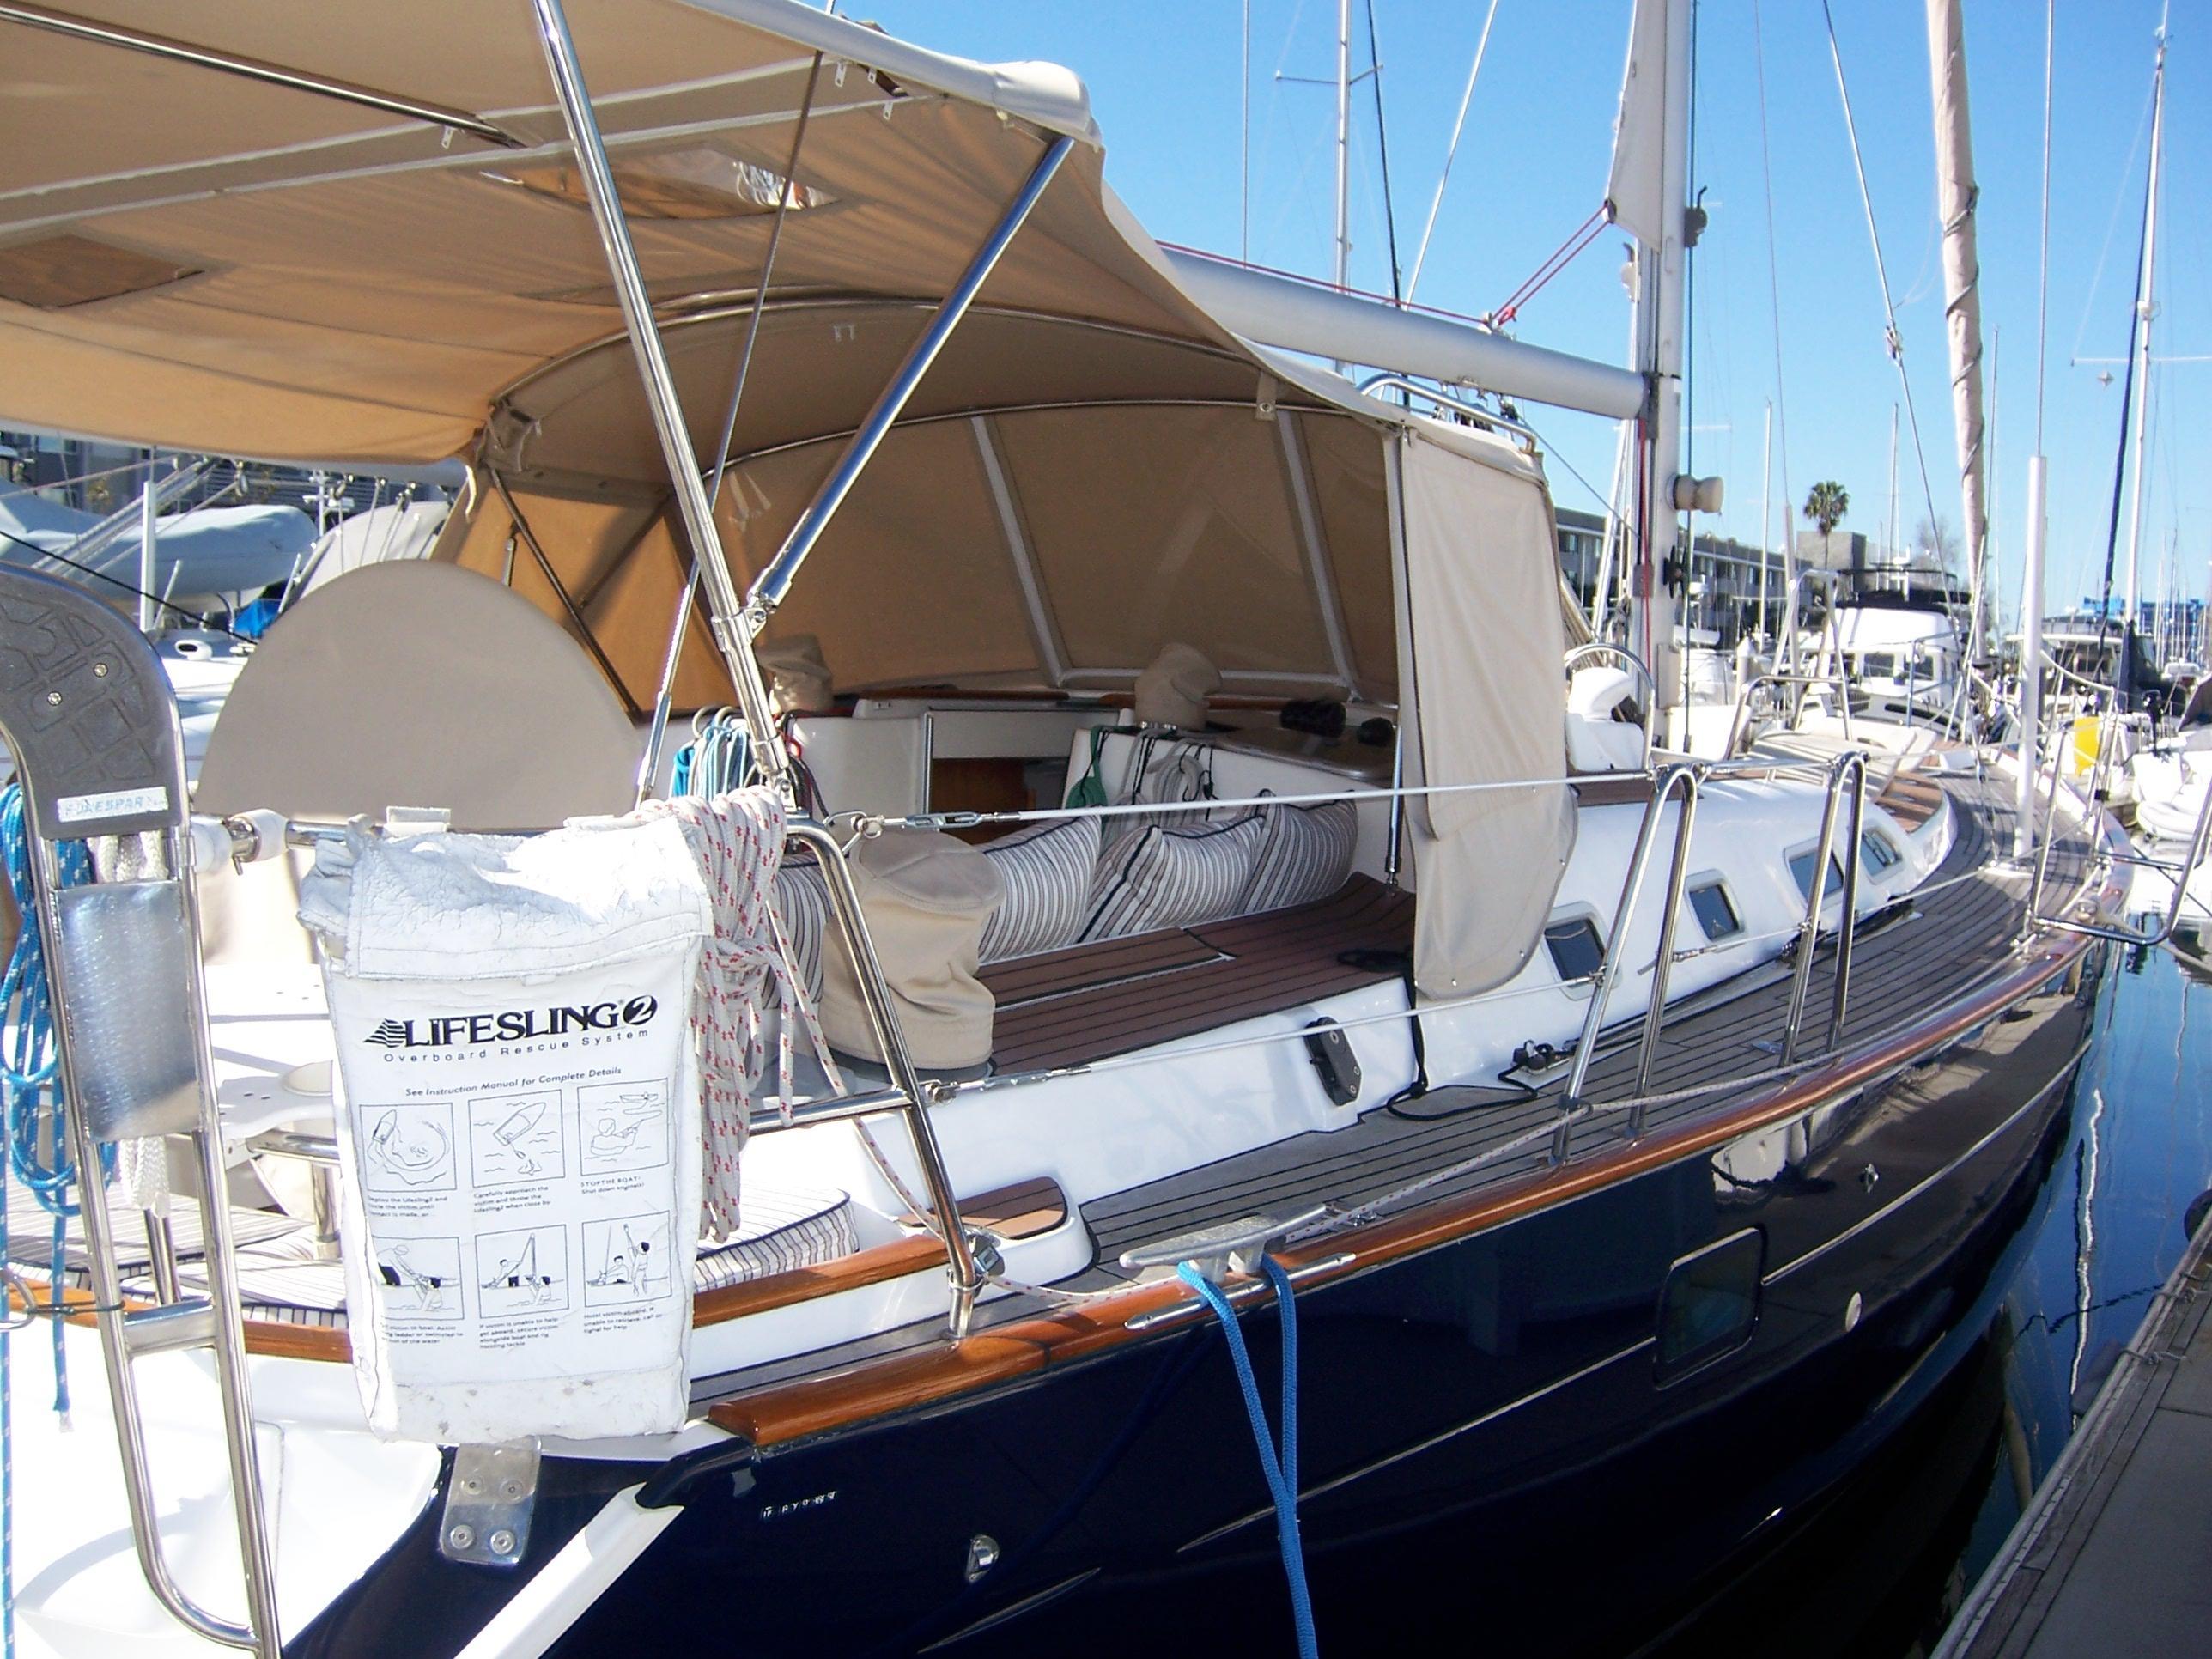 47 beneteau 2007 marina del rey california sold on 2018 03 16 by rh denisonyachtsales com Beneteau Sailboats Family Beneteau Center Cockpit Sailboats